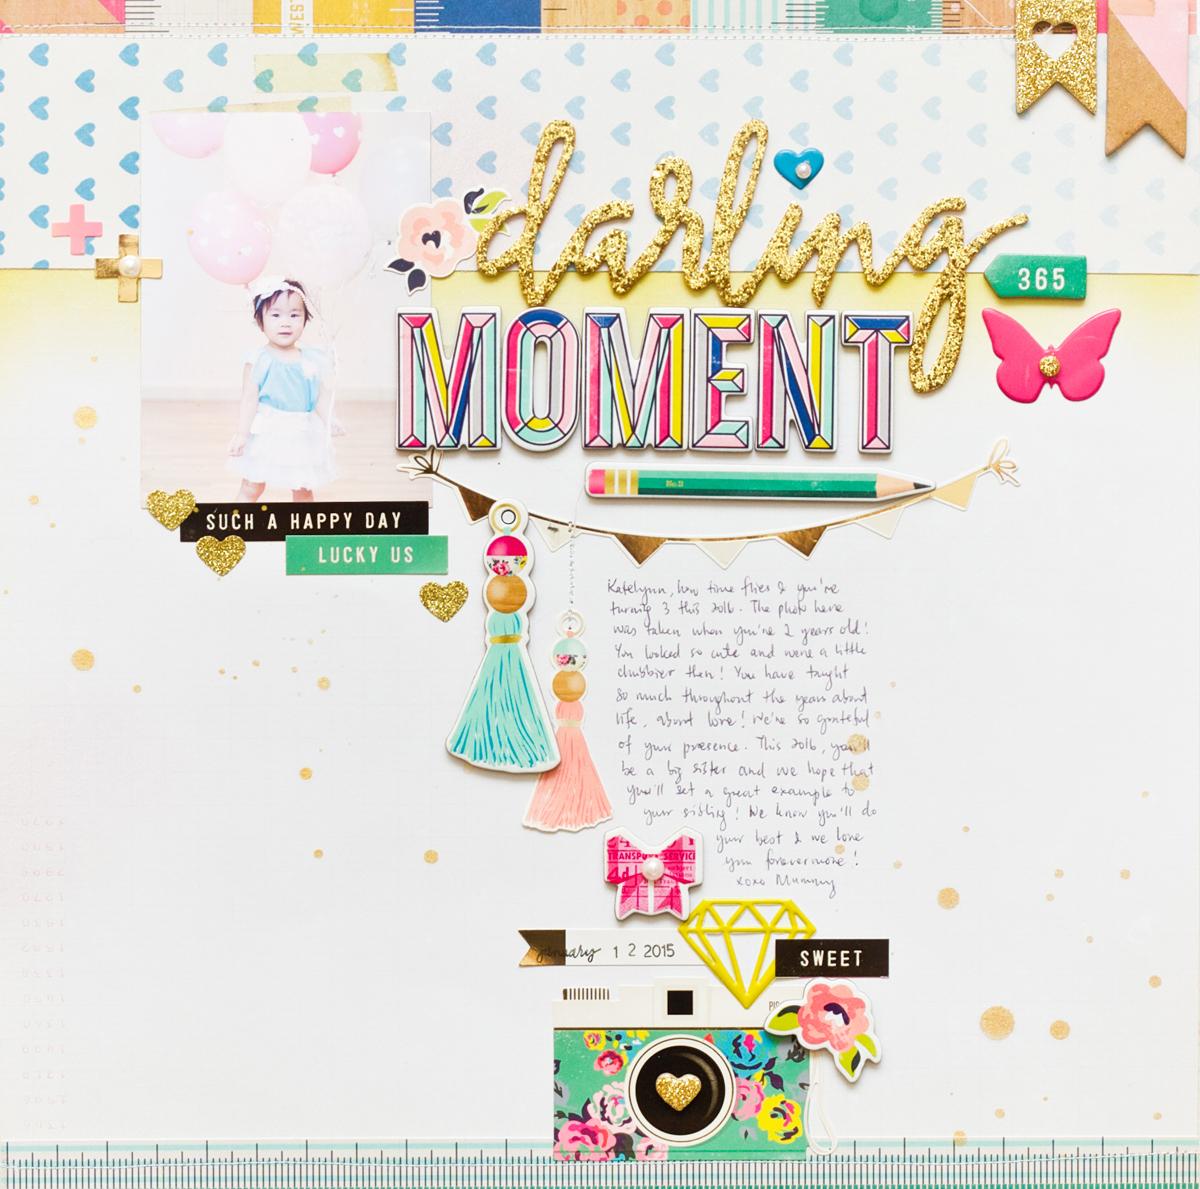 DarlingMoment_1